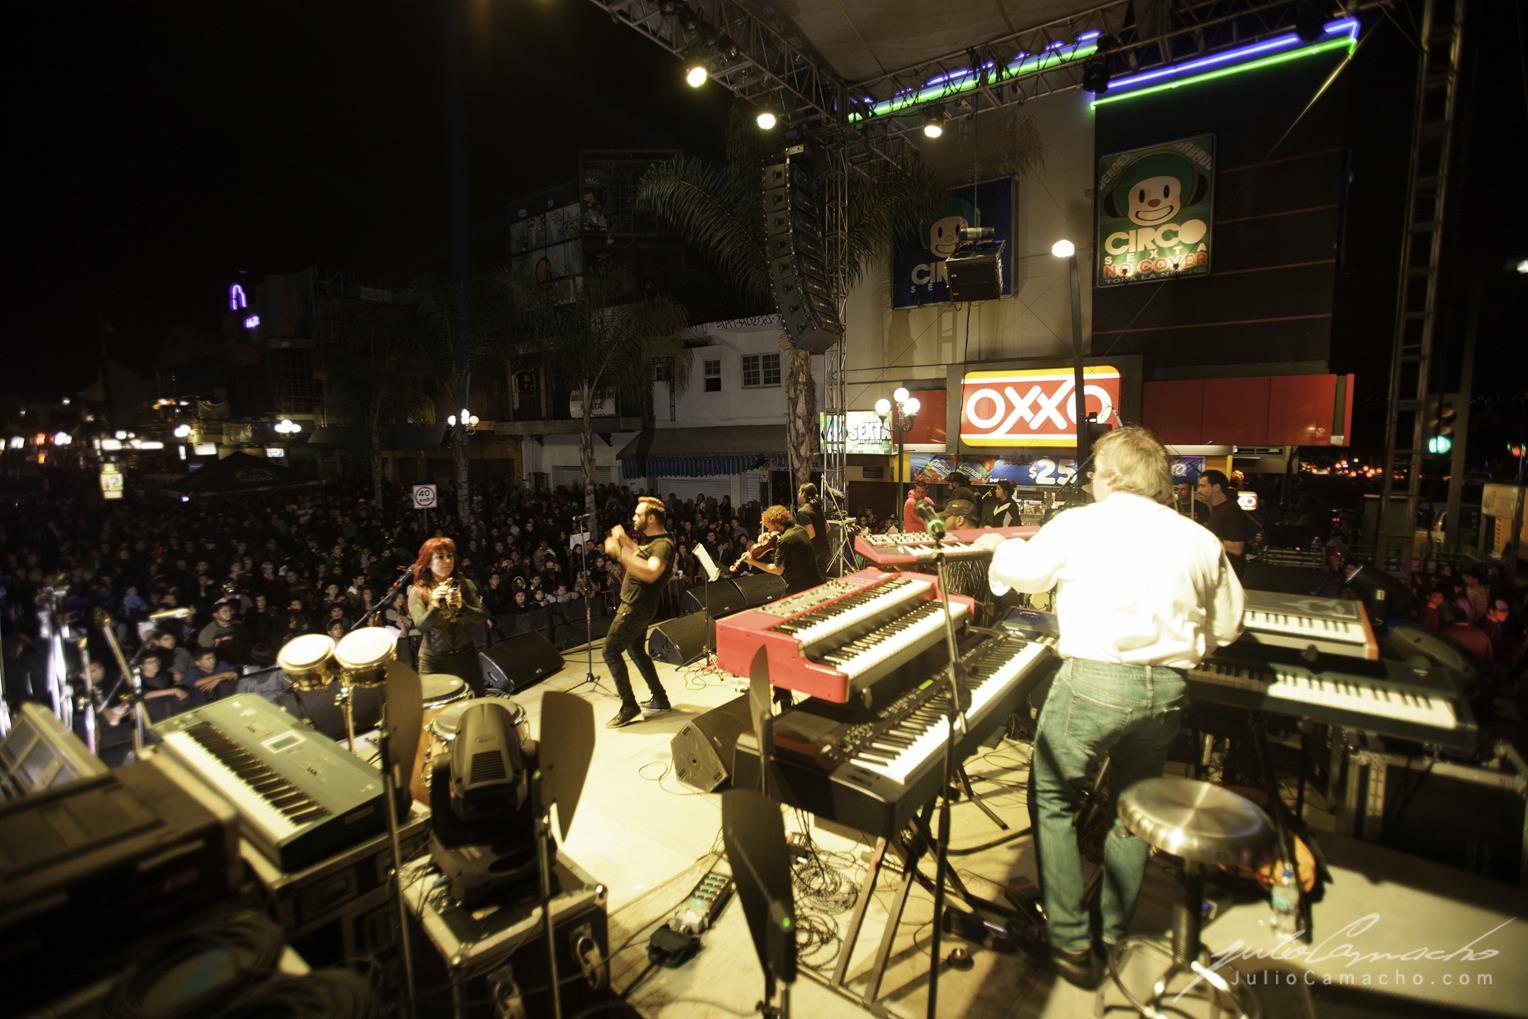 2014-10-30 31 CAST TOUR Ensenada y Tijuana - 1708 - www.Juli (Copy).jpg